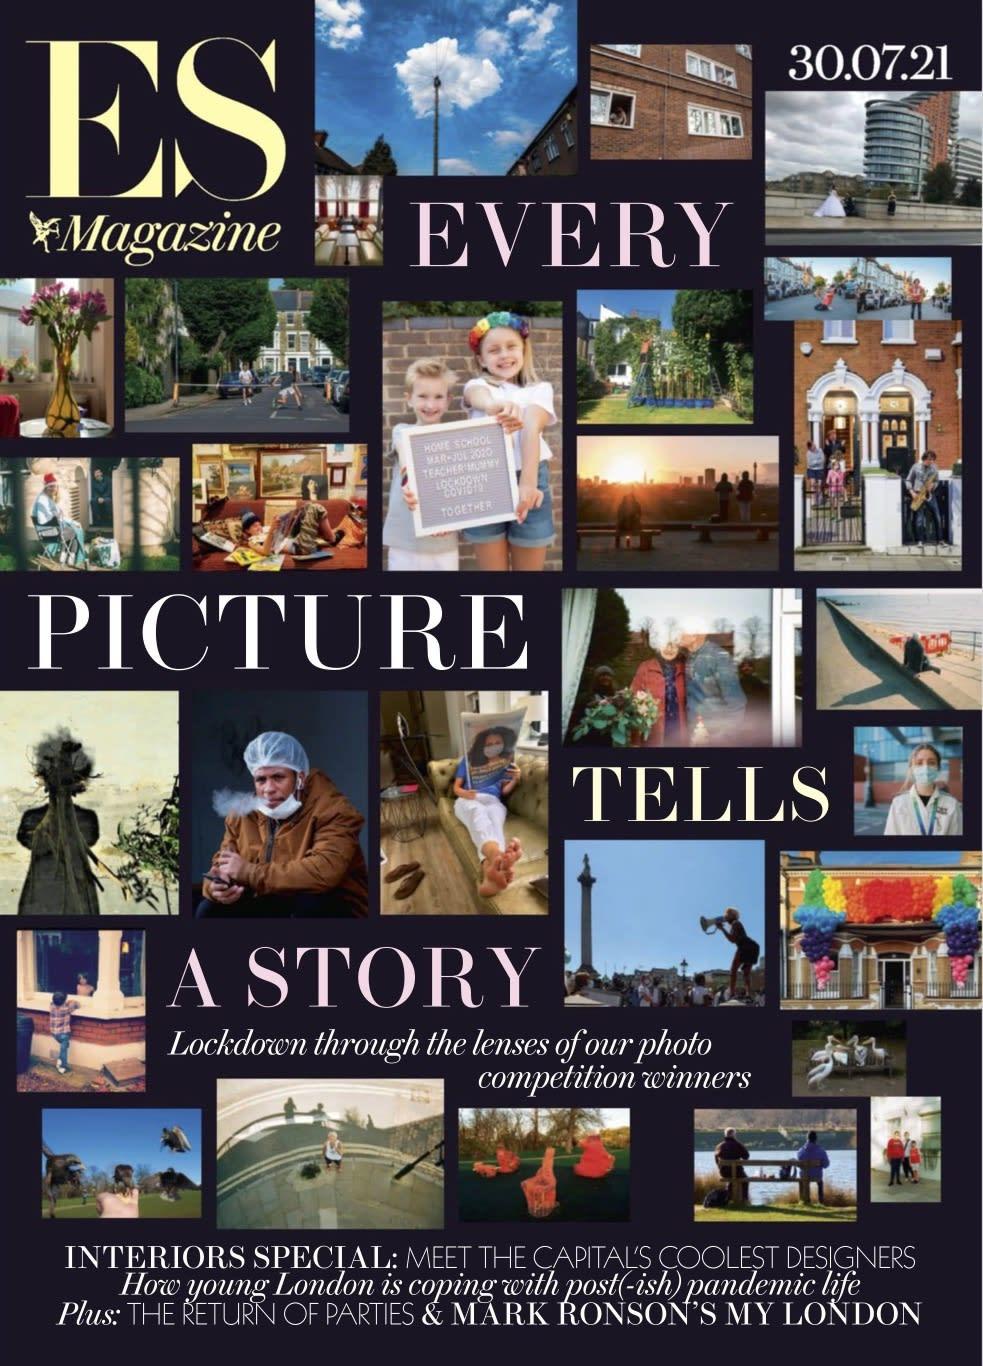 8 Holland Street in ES Magazine Interiors Special